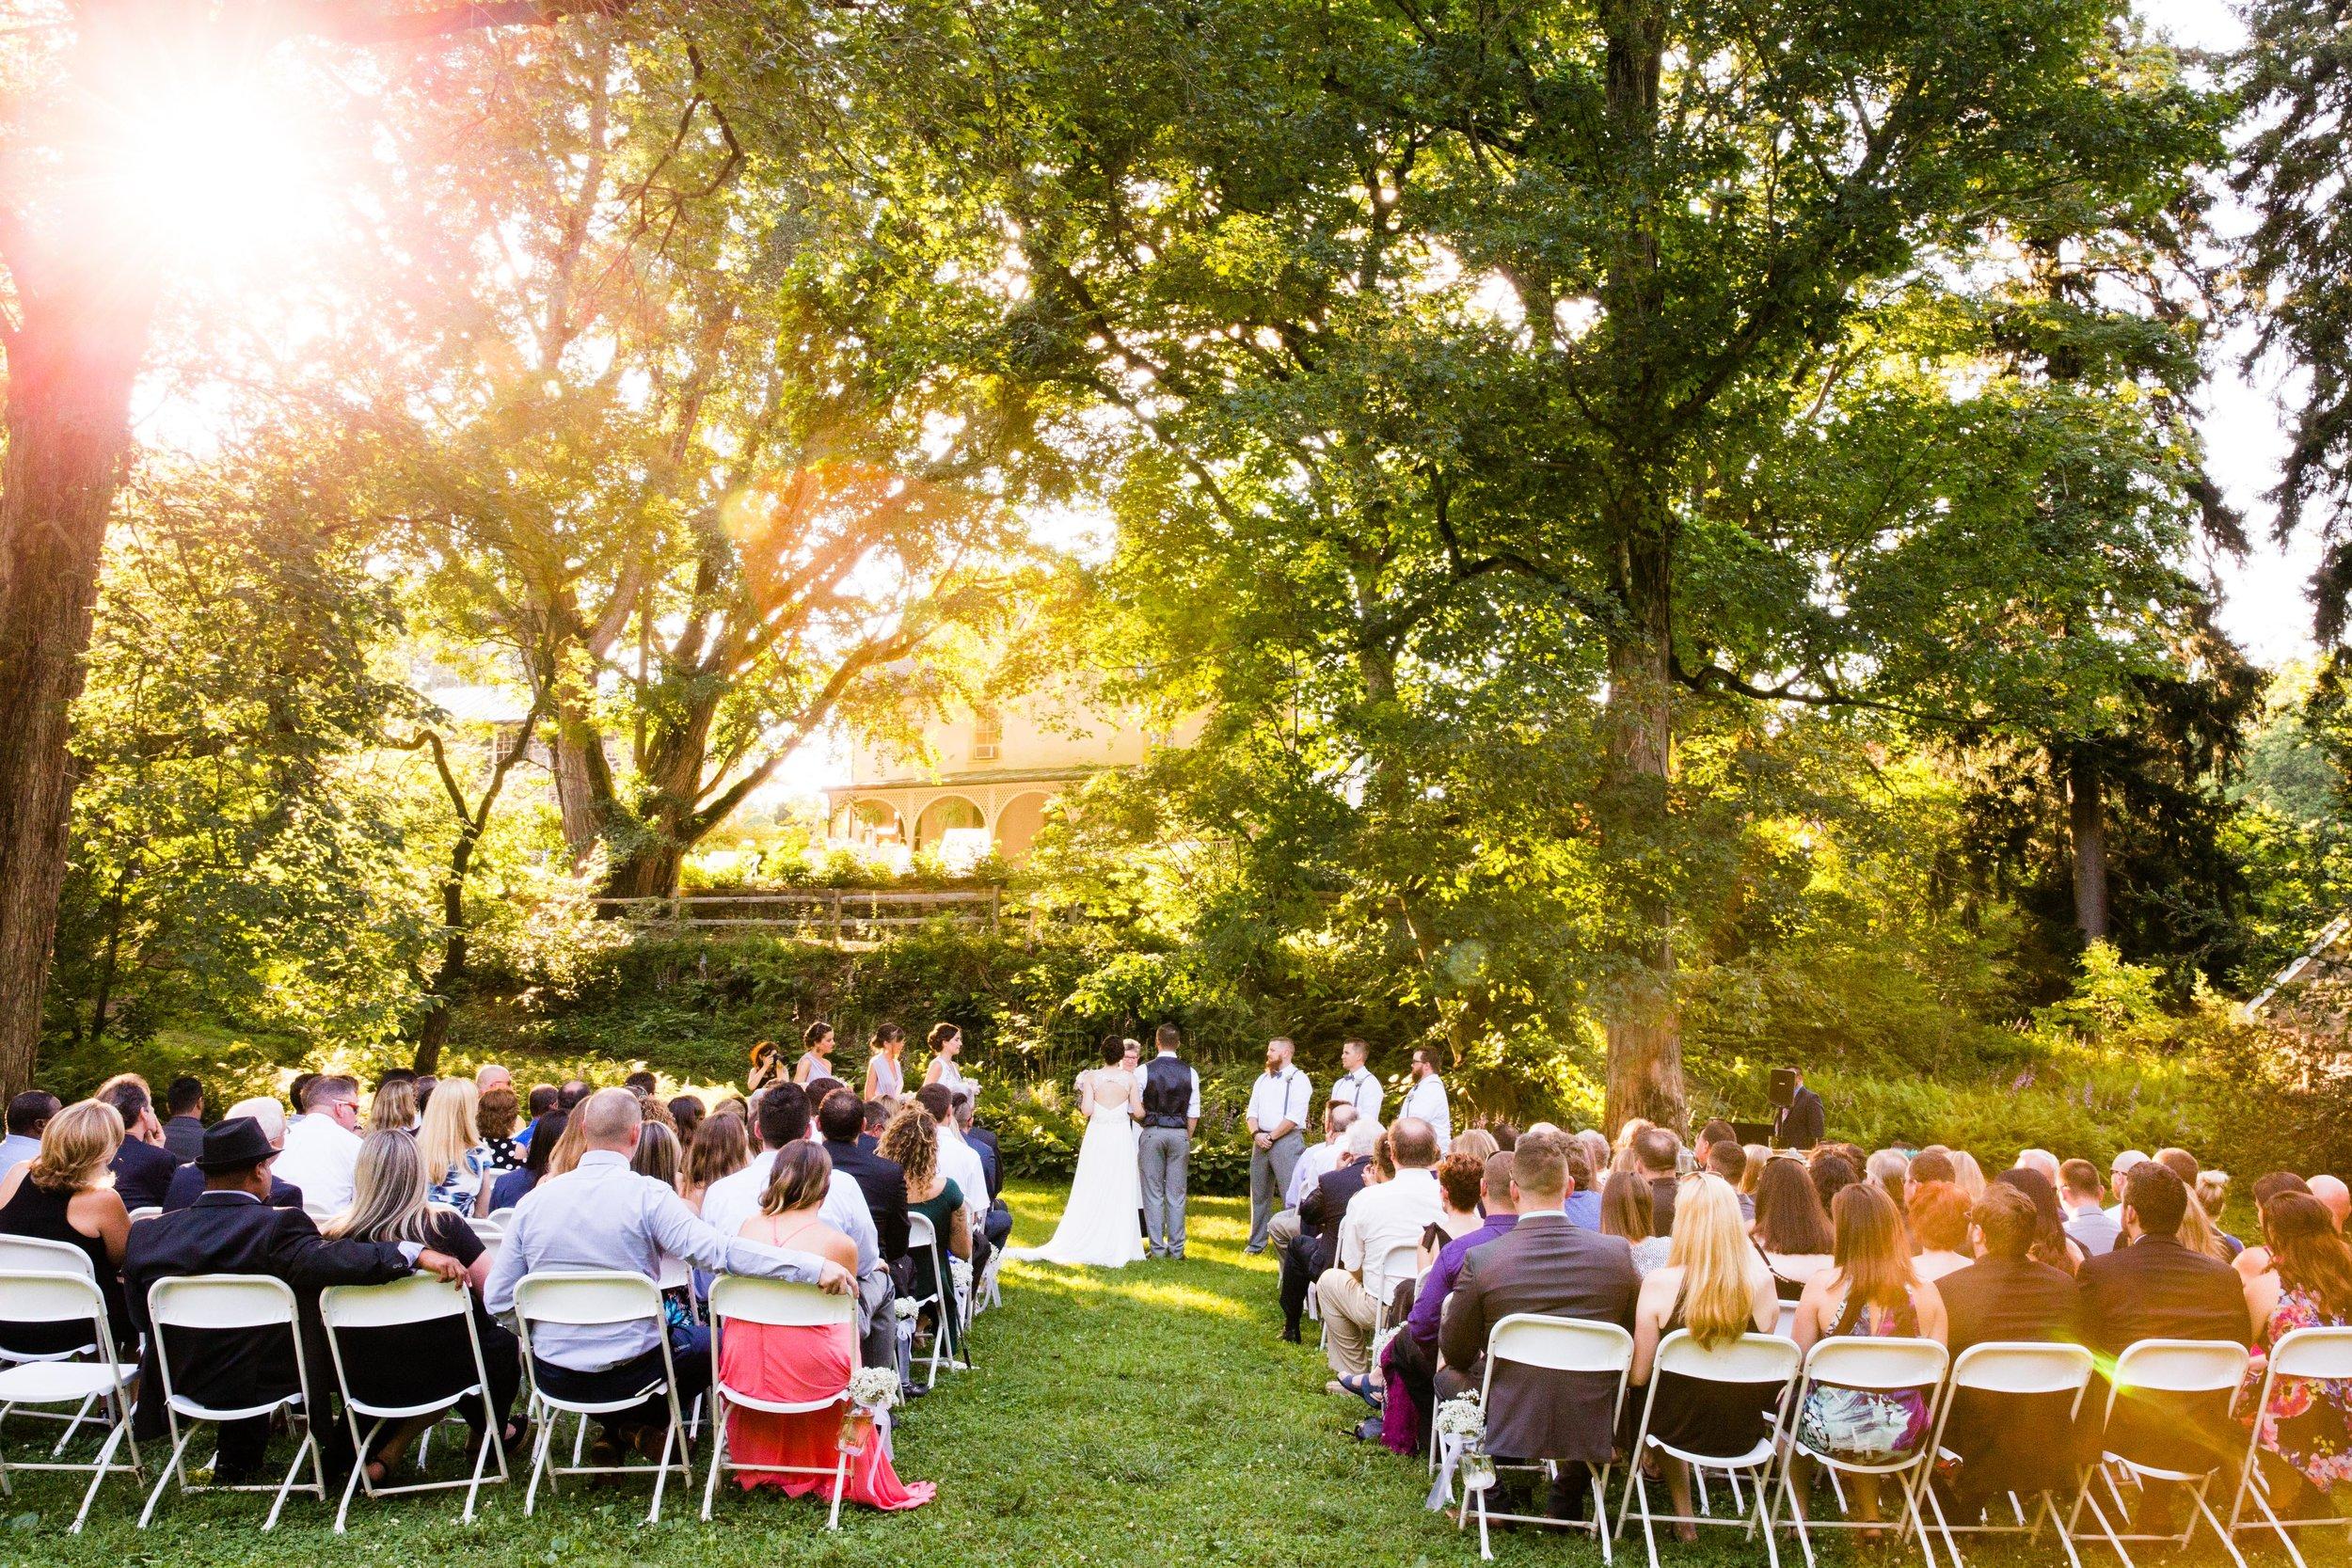 TYLER ARBORETUM WEDDING PHOTOGRAPHY LOVESTRUCK PICTURES-054.jpg